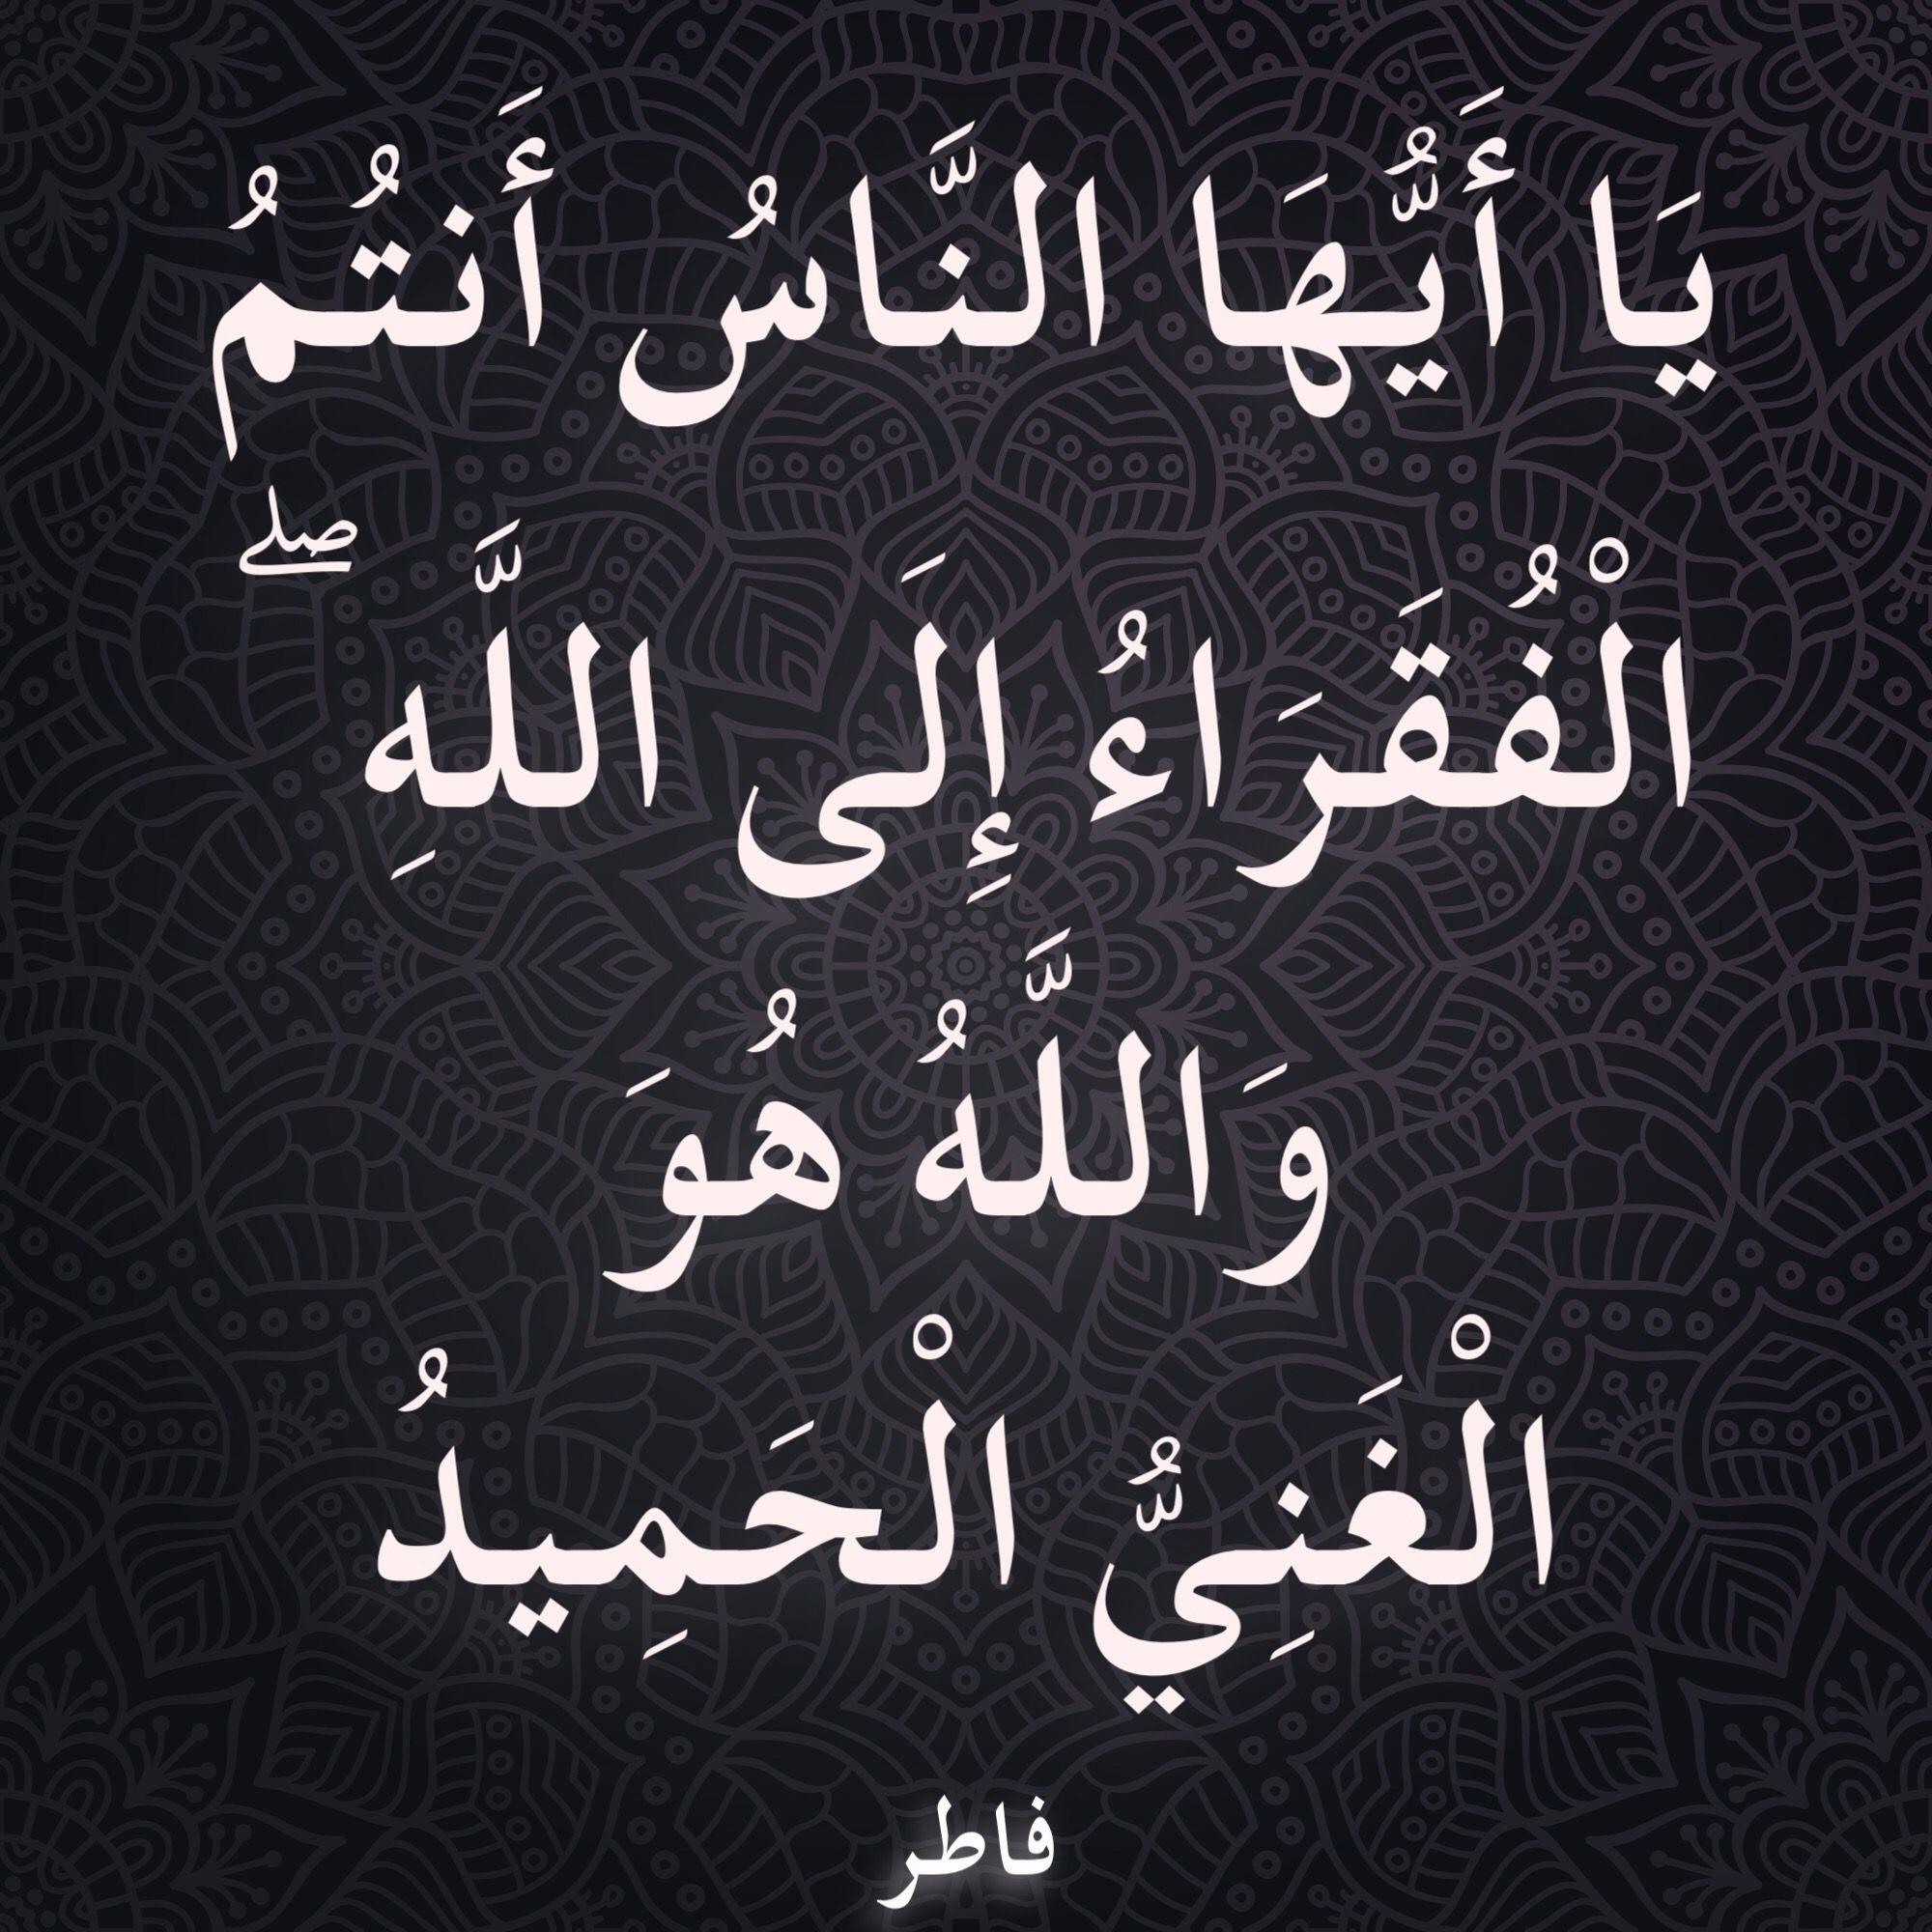 Pin By الأثر الجميل On آيات من القرآن الكريم Arabic Calligraphy